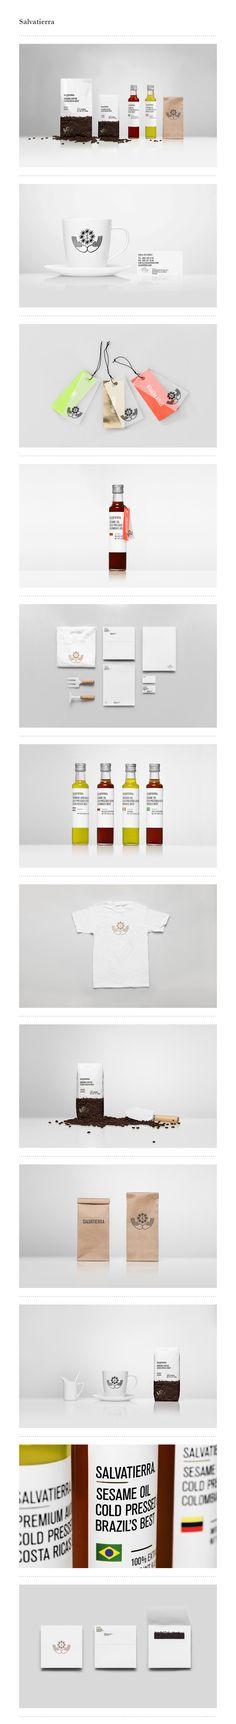 Salvatierra / Anagrama. #packaging #branding #marketing. PD